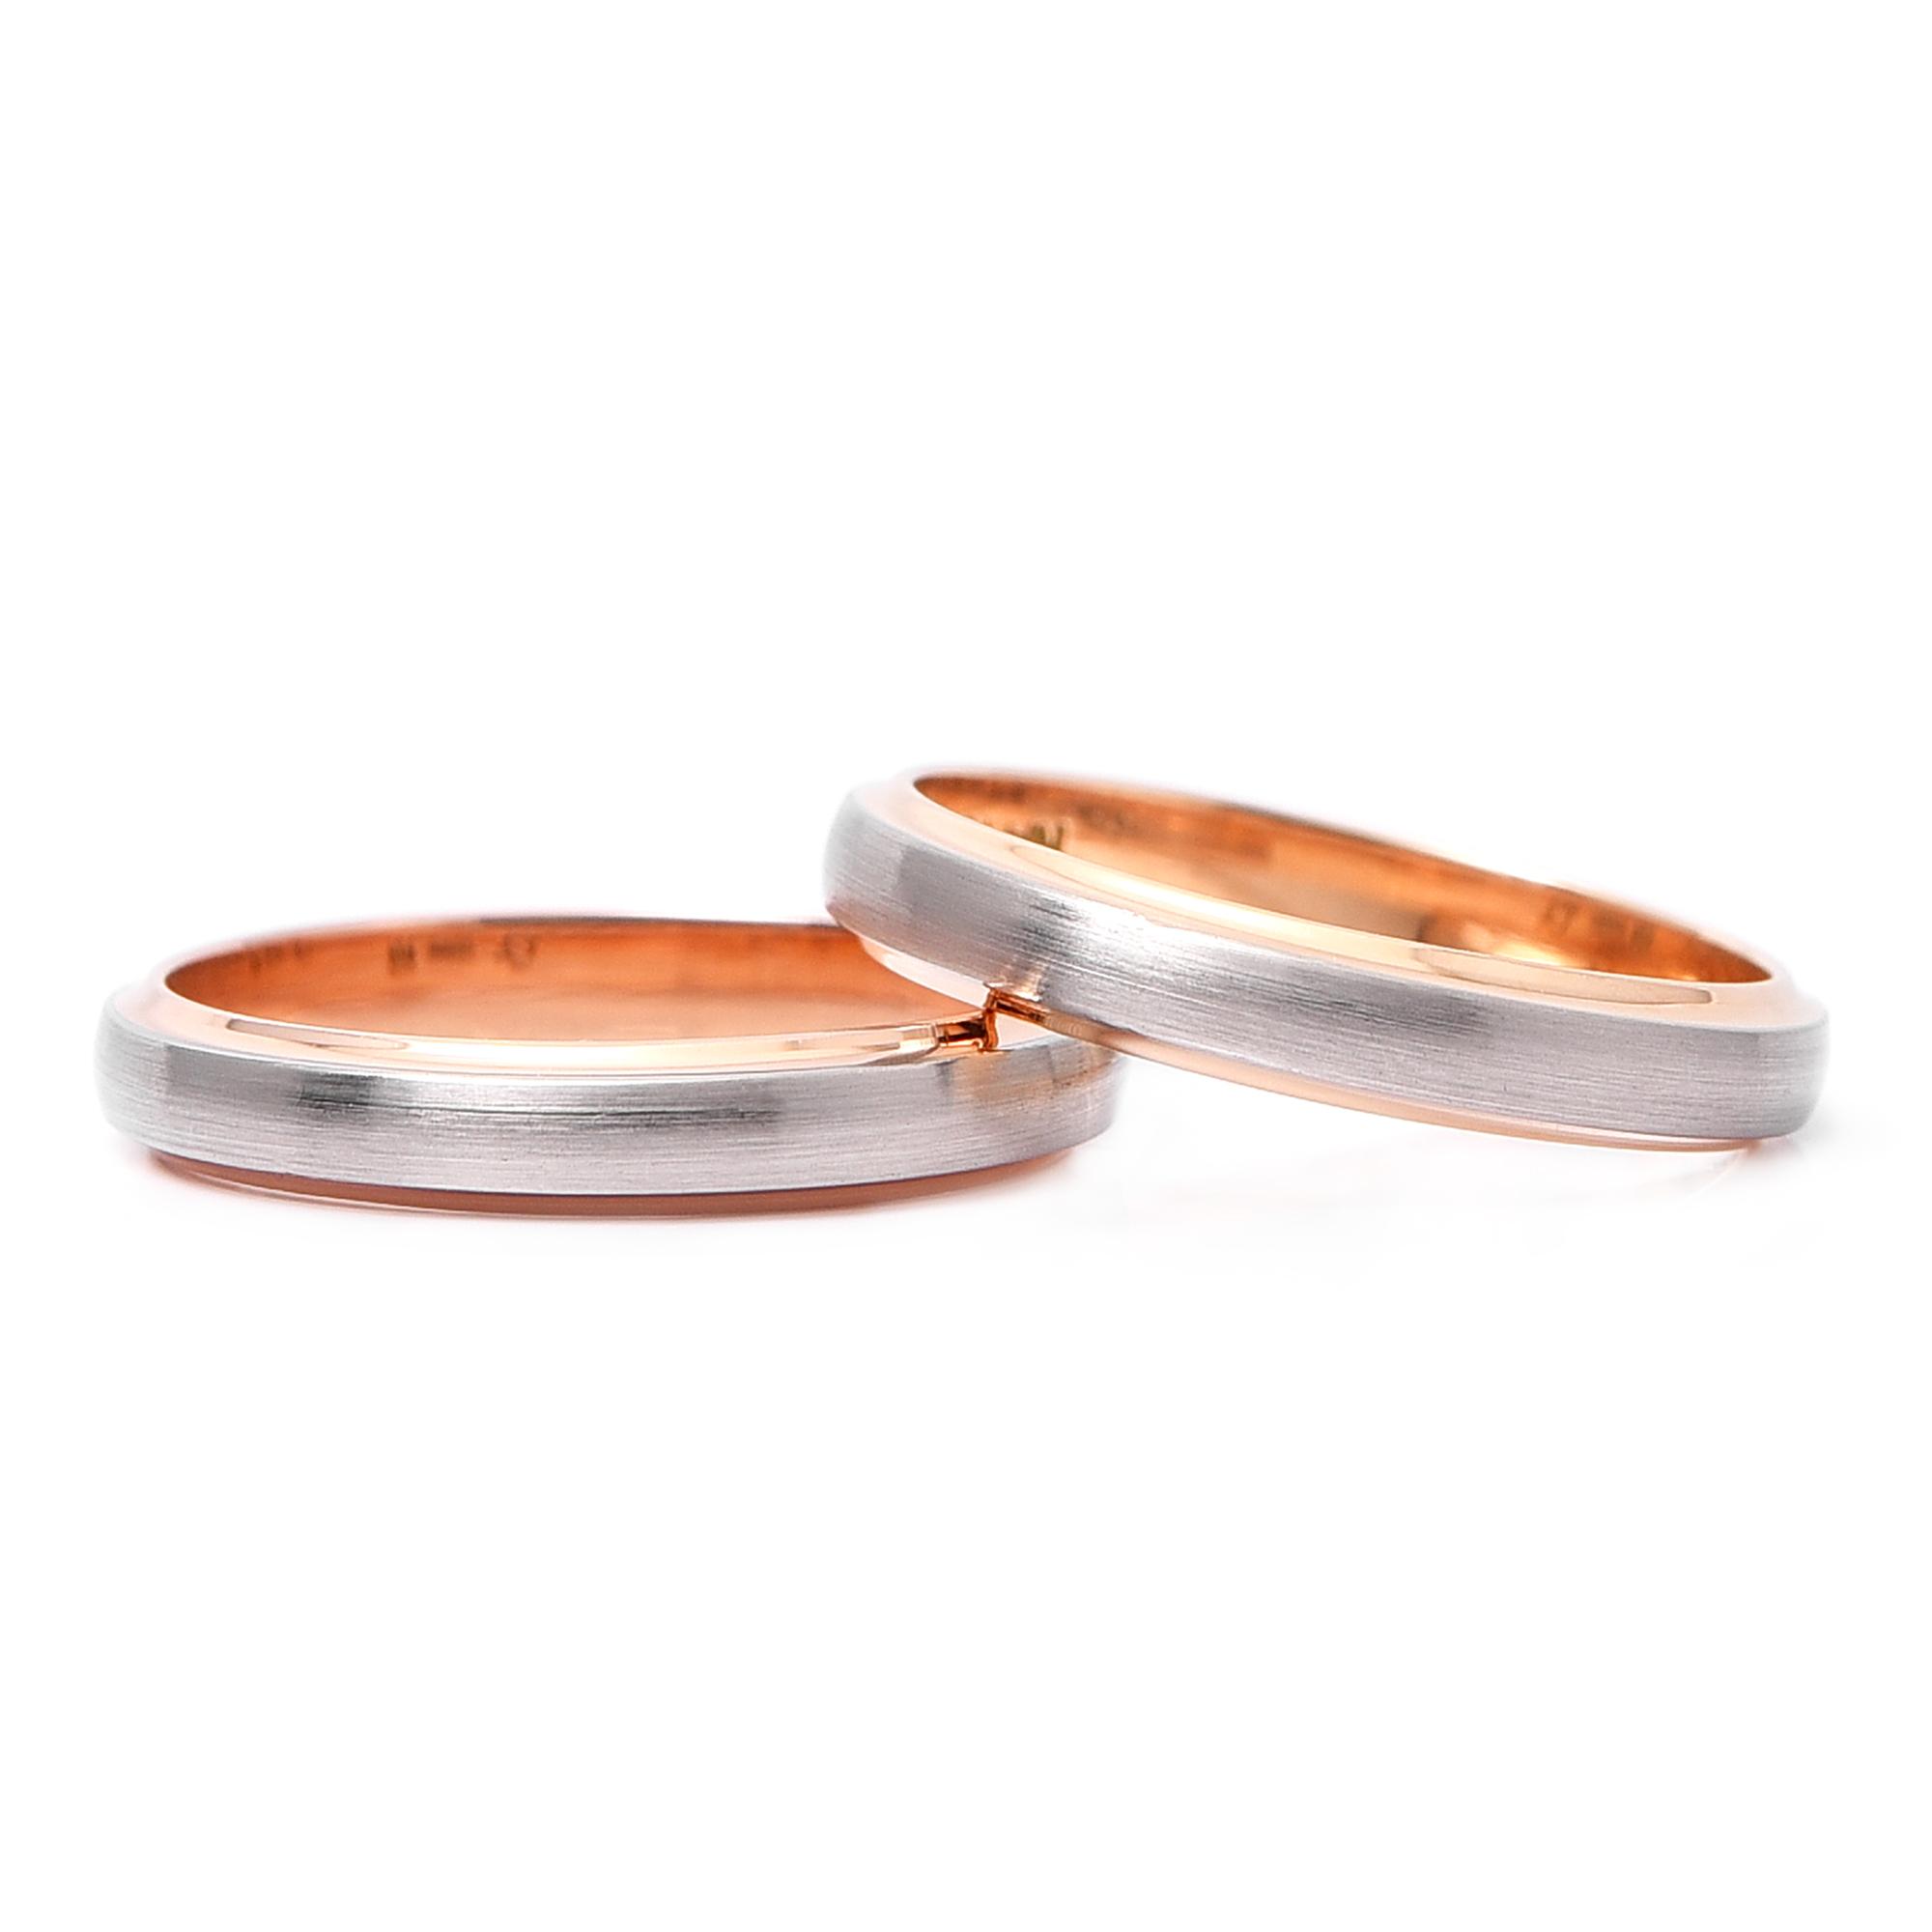 輪高崎工房の結婚指輪|HR-269